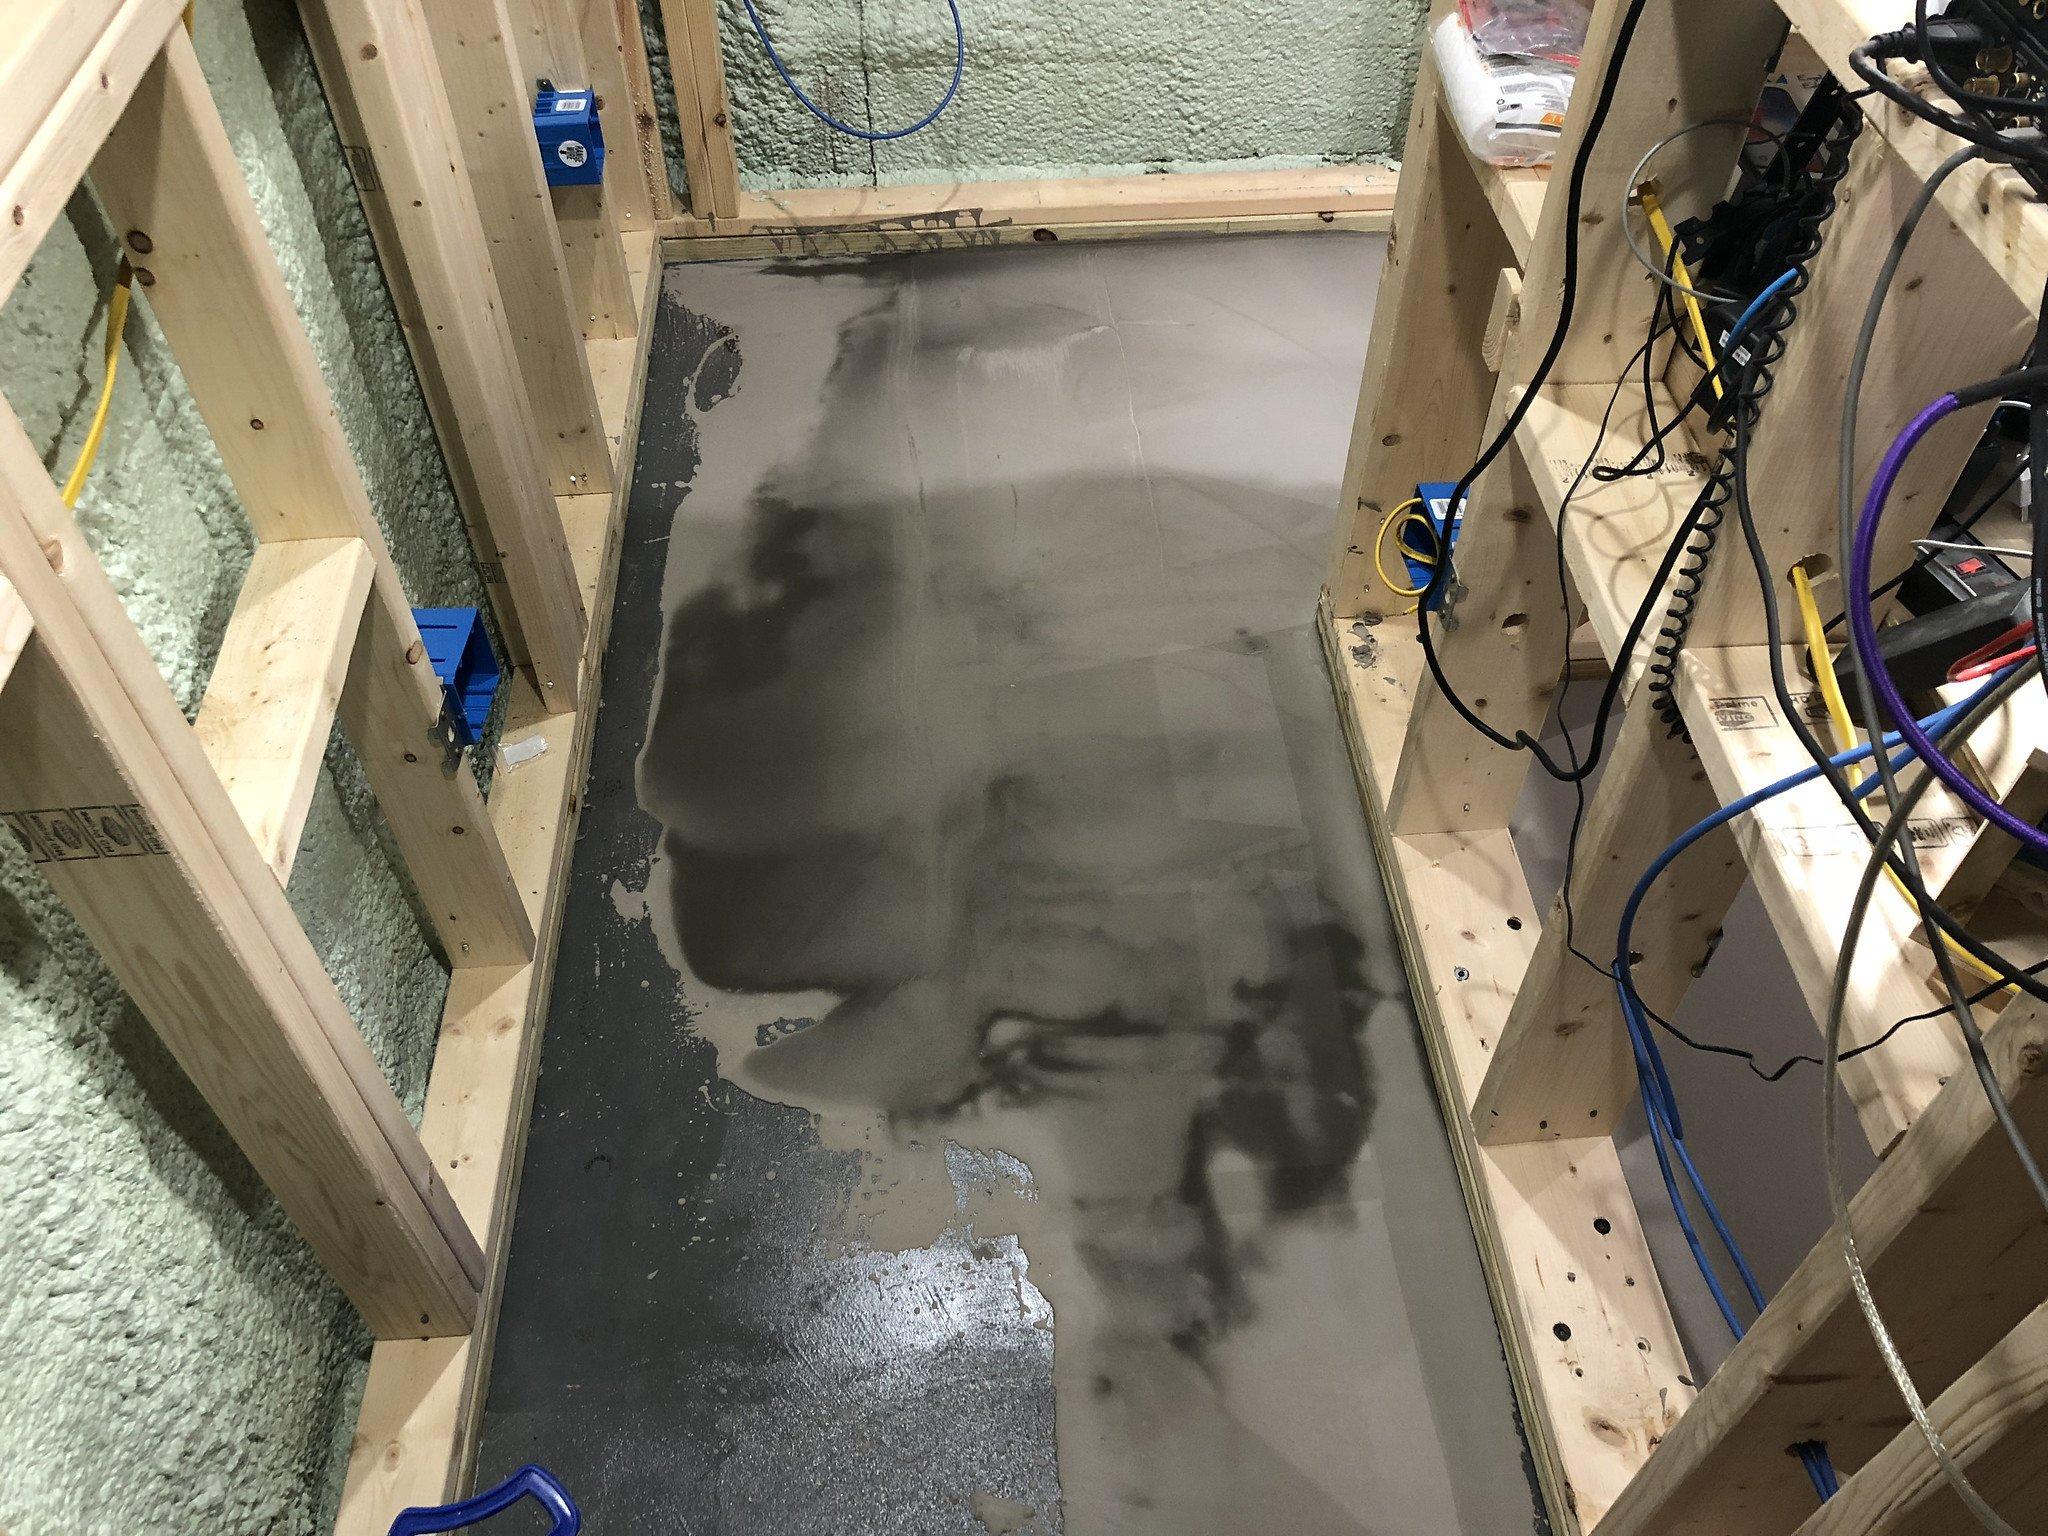 leveling a wood subfloor, self-leveling compound, wood subfloor